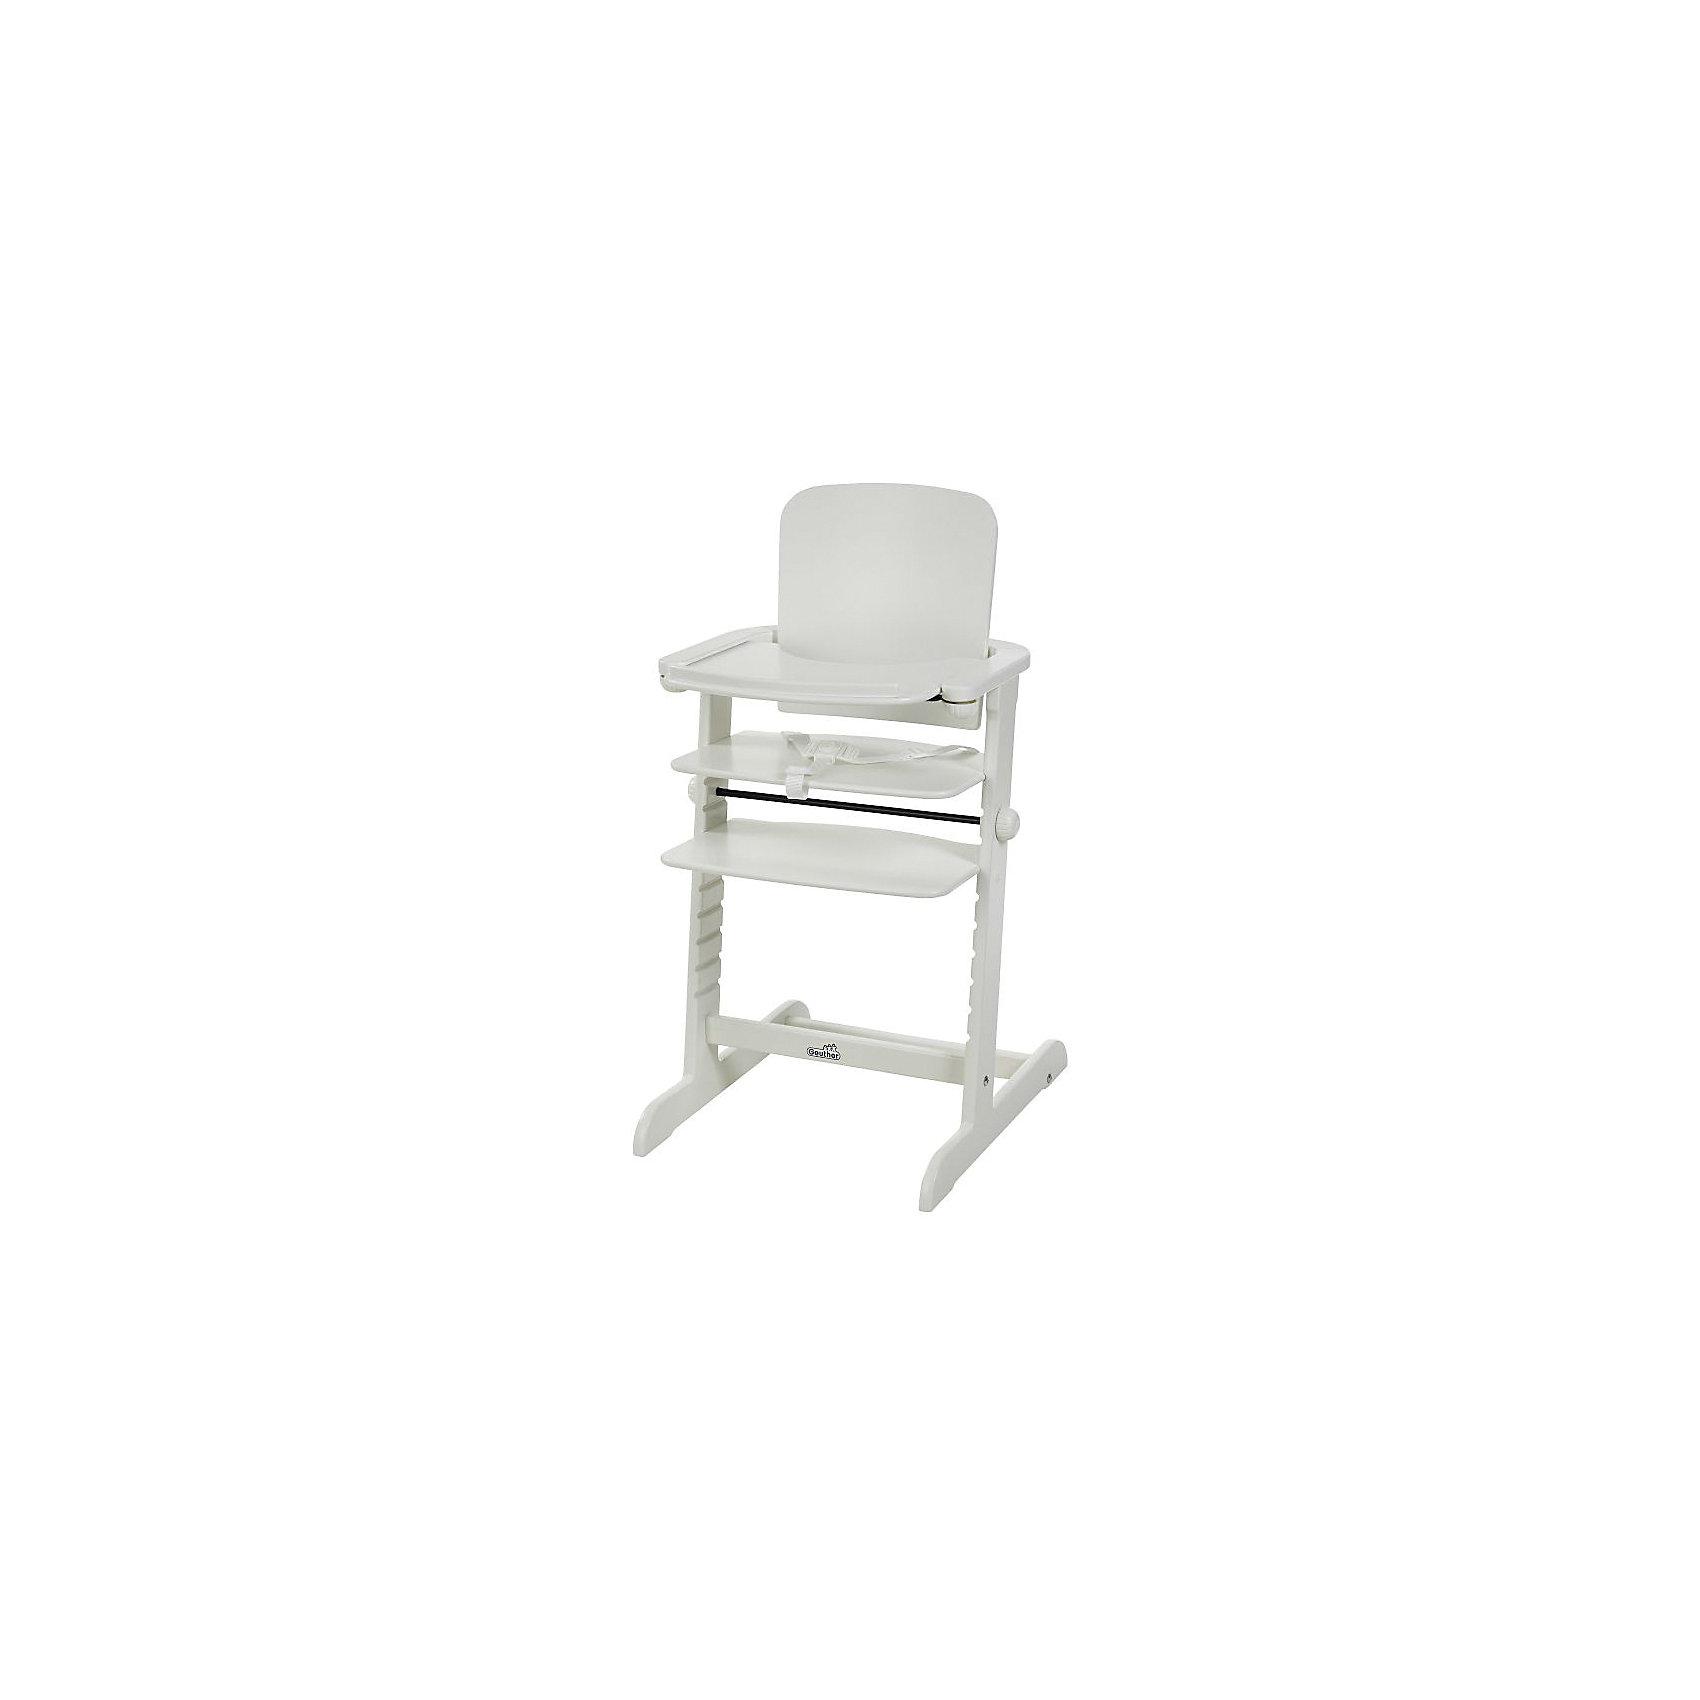 Geuther Стульчик для кормления FAMILY, Geuther, белый столик geuther столик для стульчика geuther tamino белый